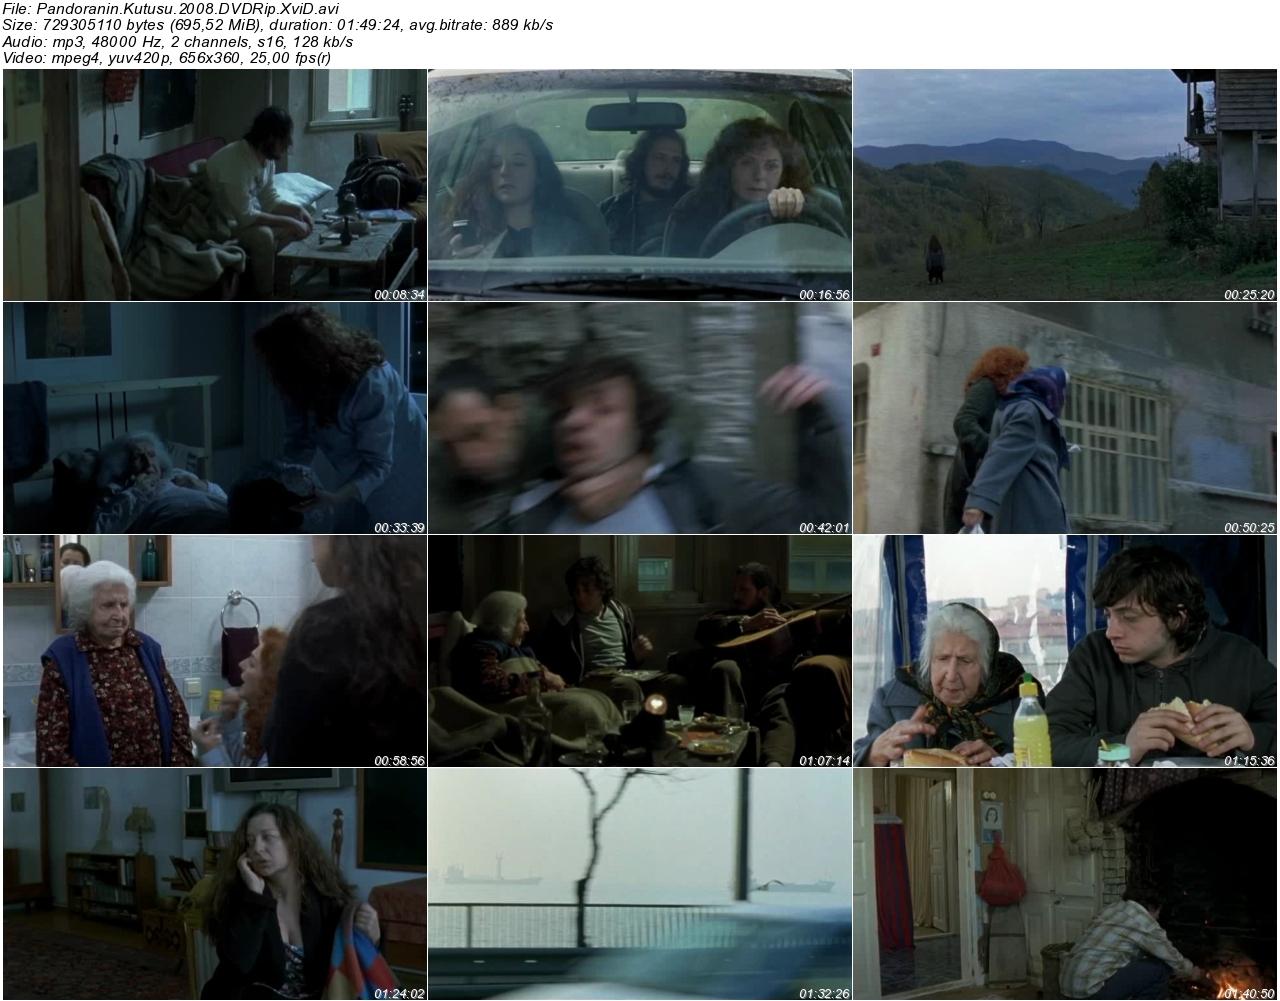 Pandoranın Kutusu 2008 - DVDRip XviD - Tek Link indir